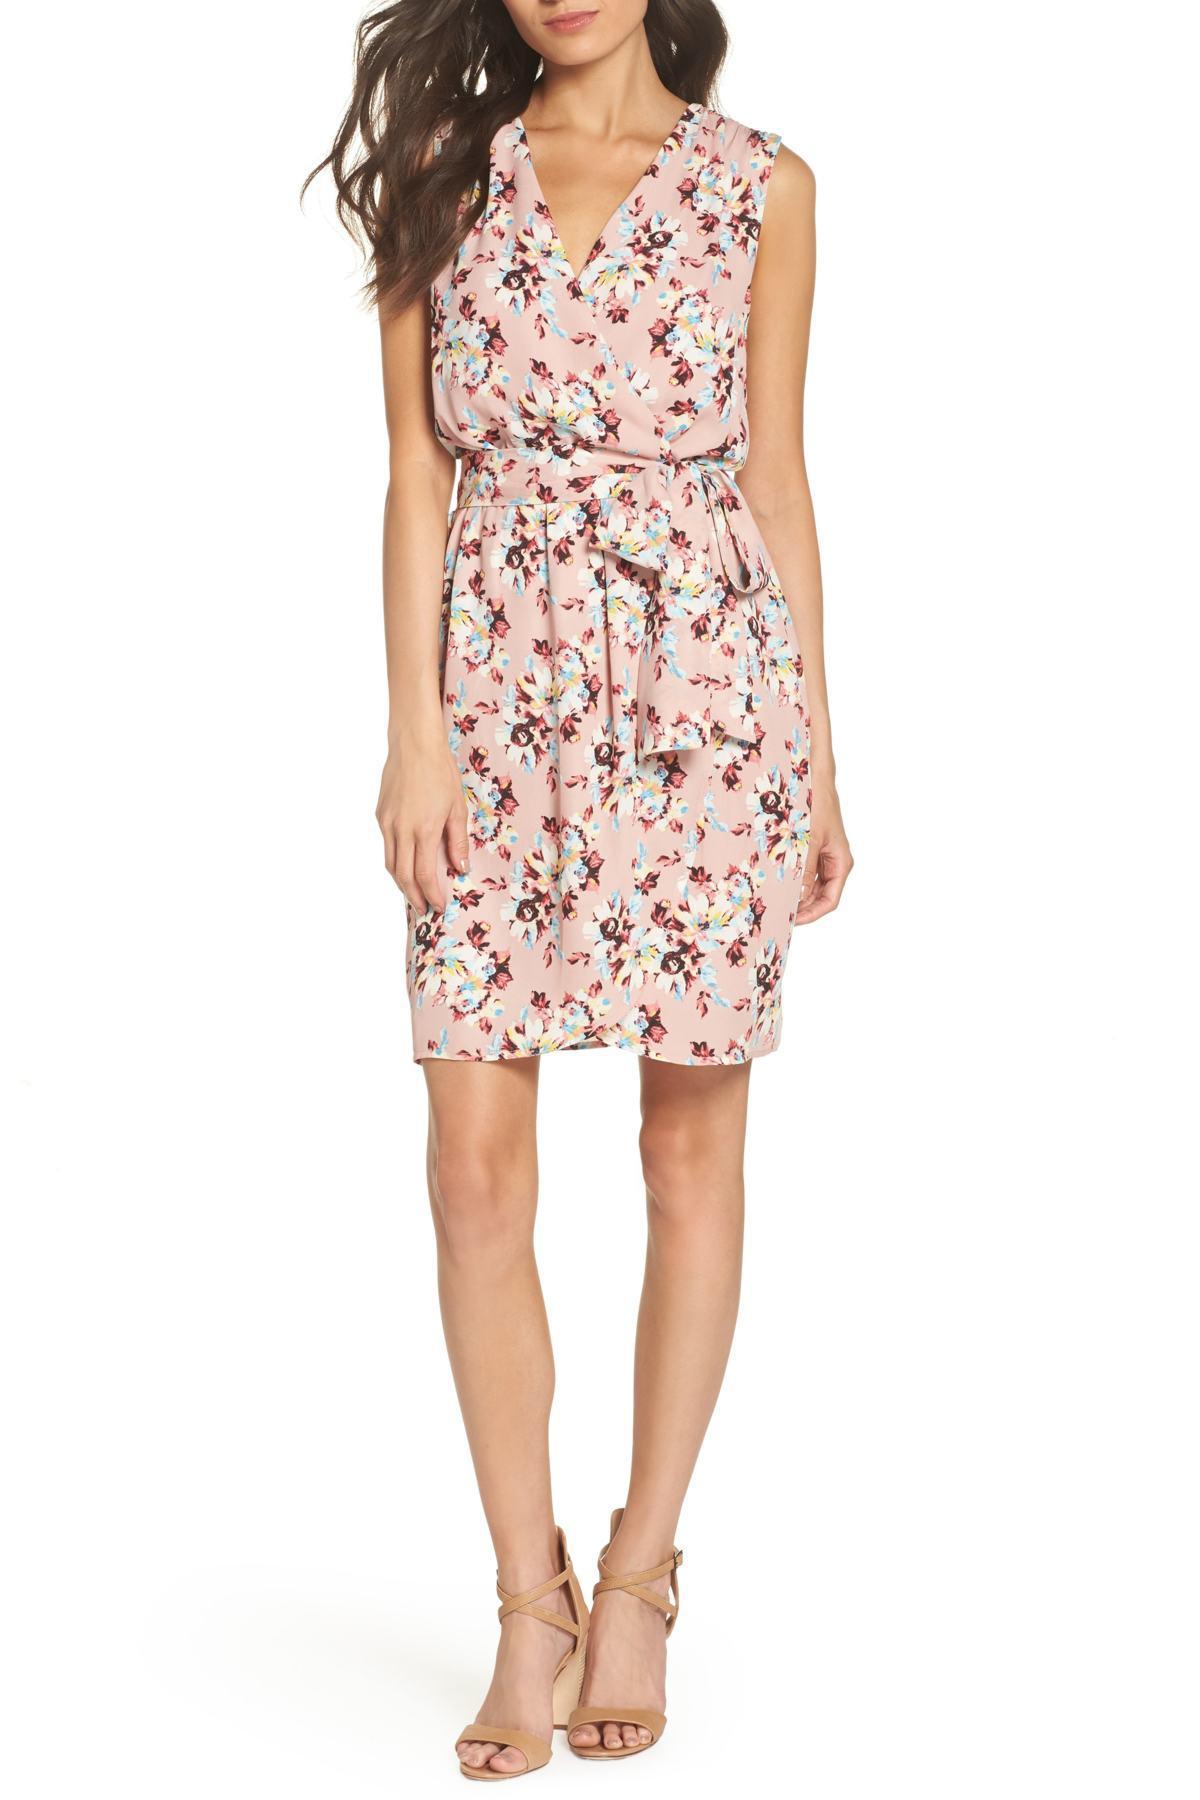 5ebb3ef1b0f7 Charles Henry. Women's Pink Floral Faux Wrap Dress (regular & Petite)